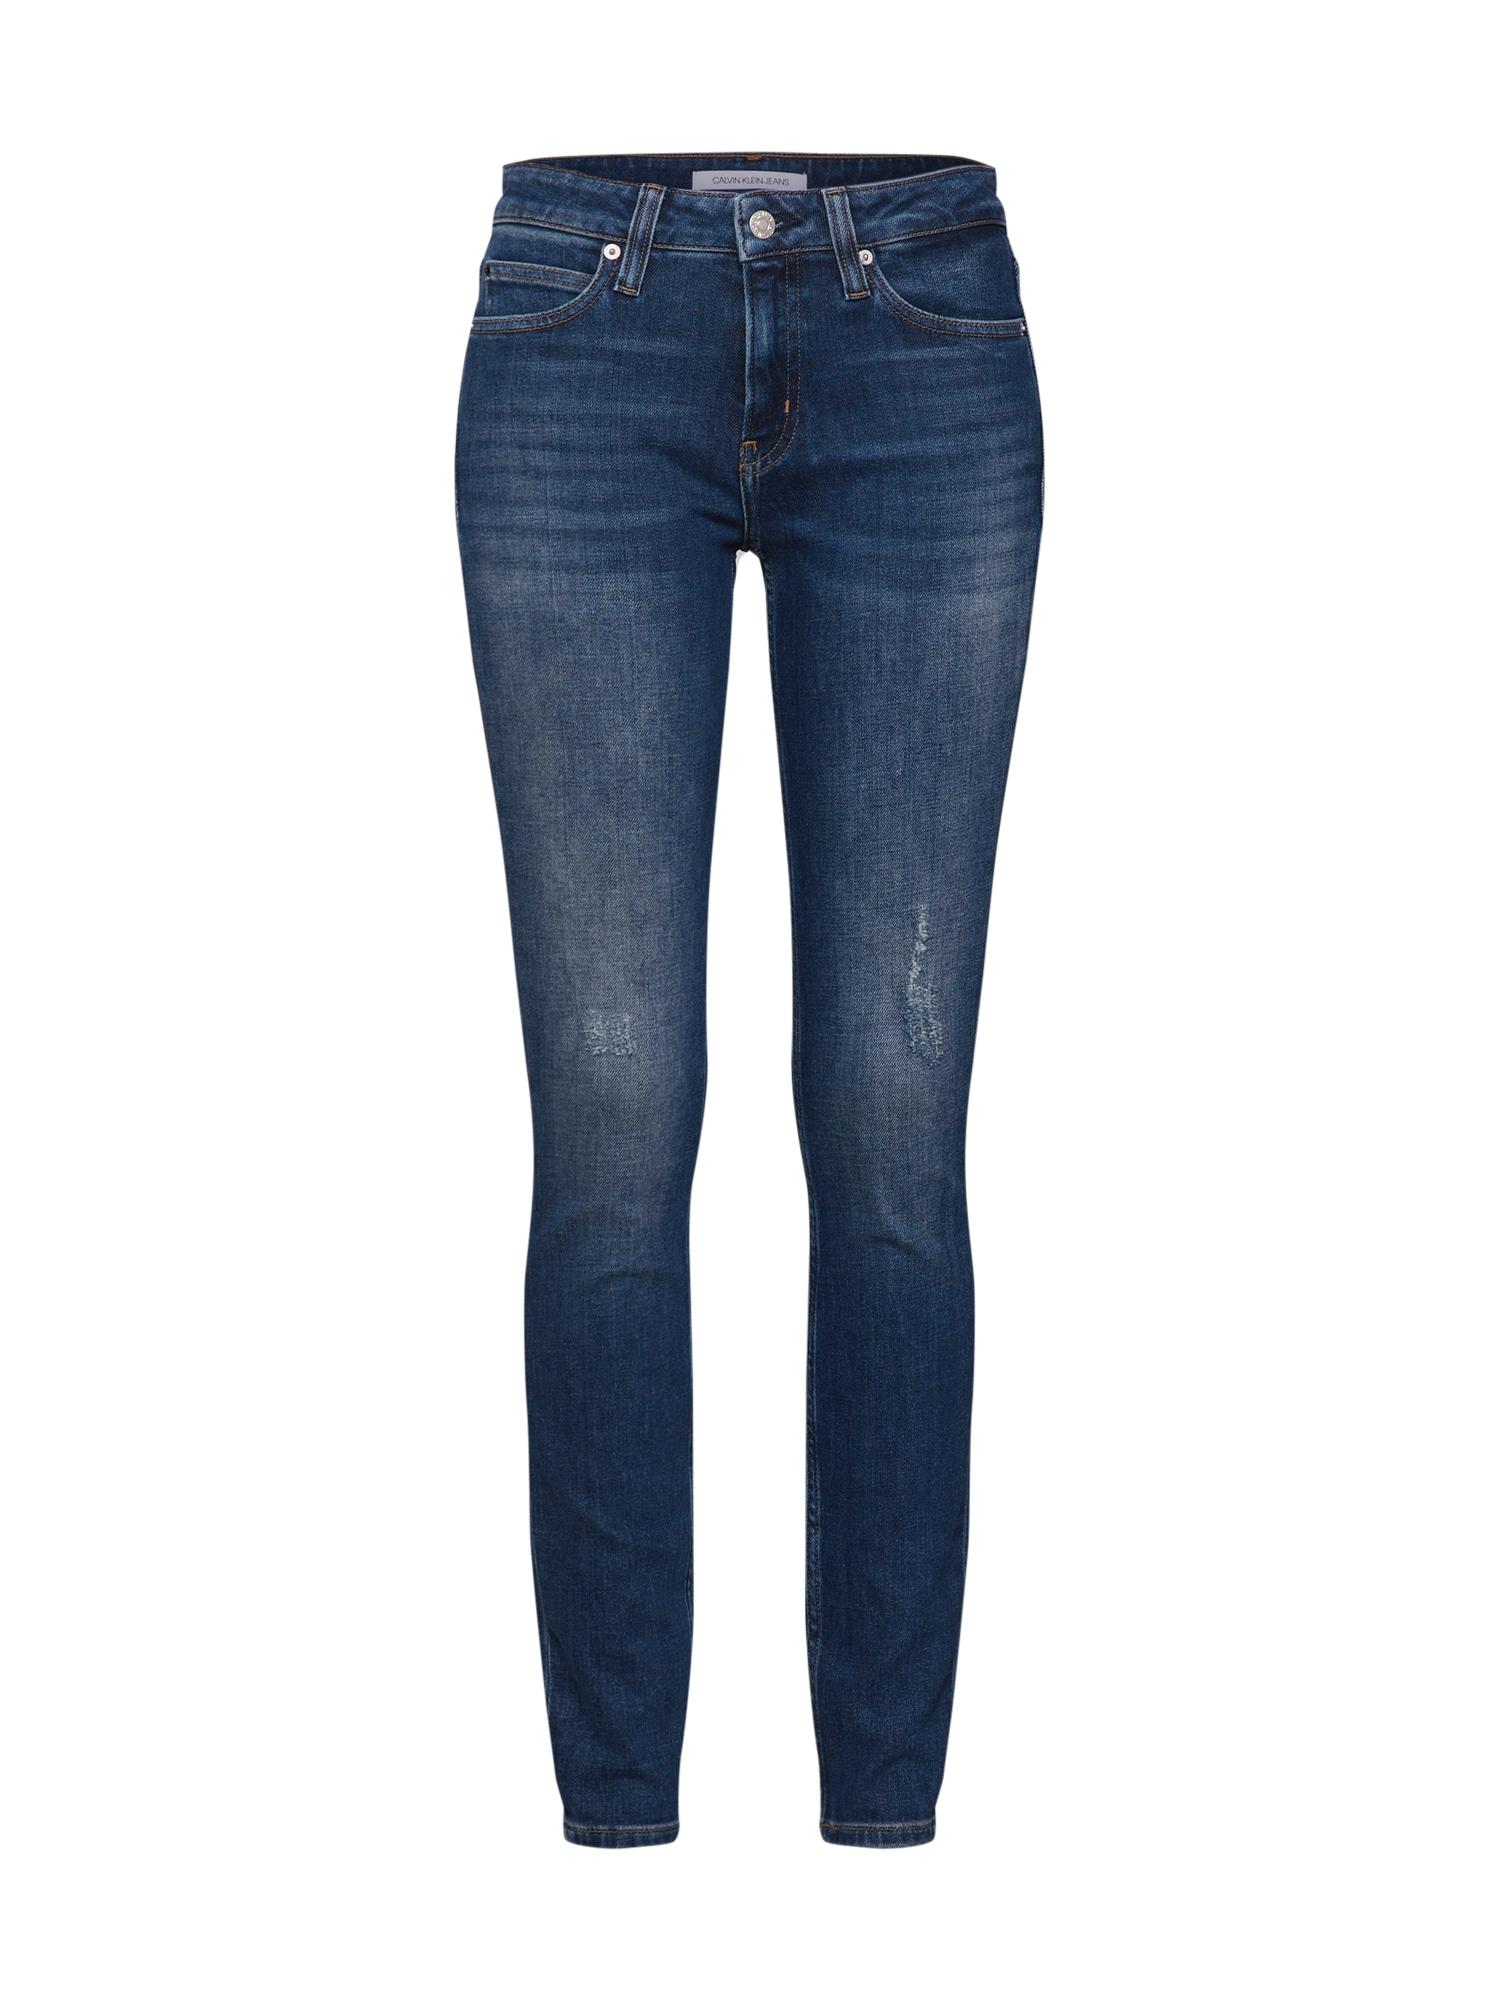 Džíny CKJ 011 MID RISE SKINNY modrá džínovina Calvin Klein Jeans